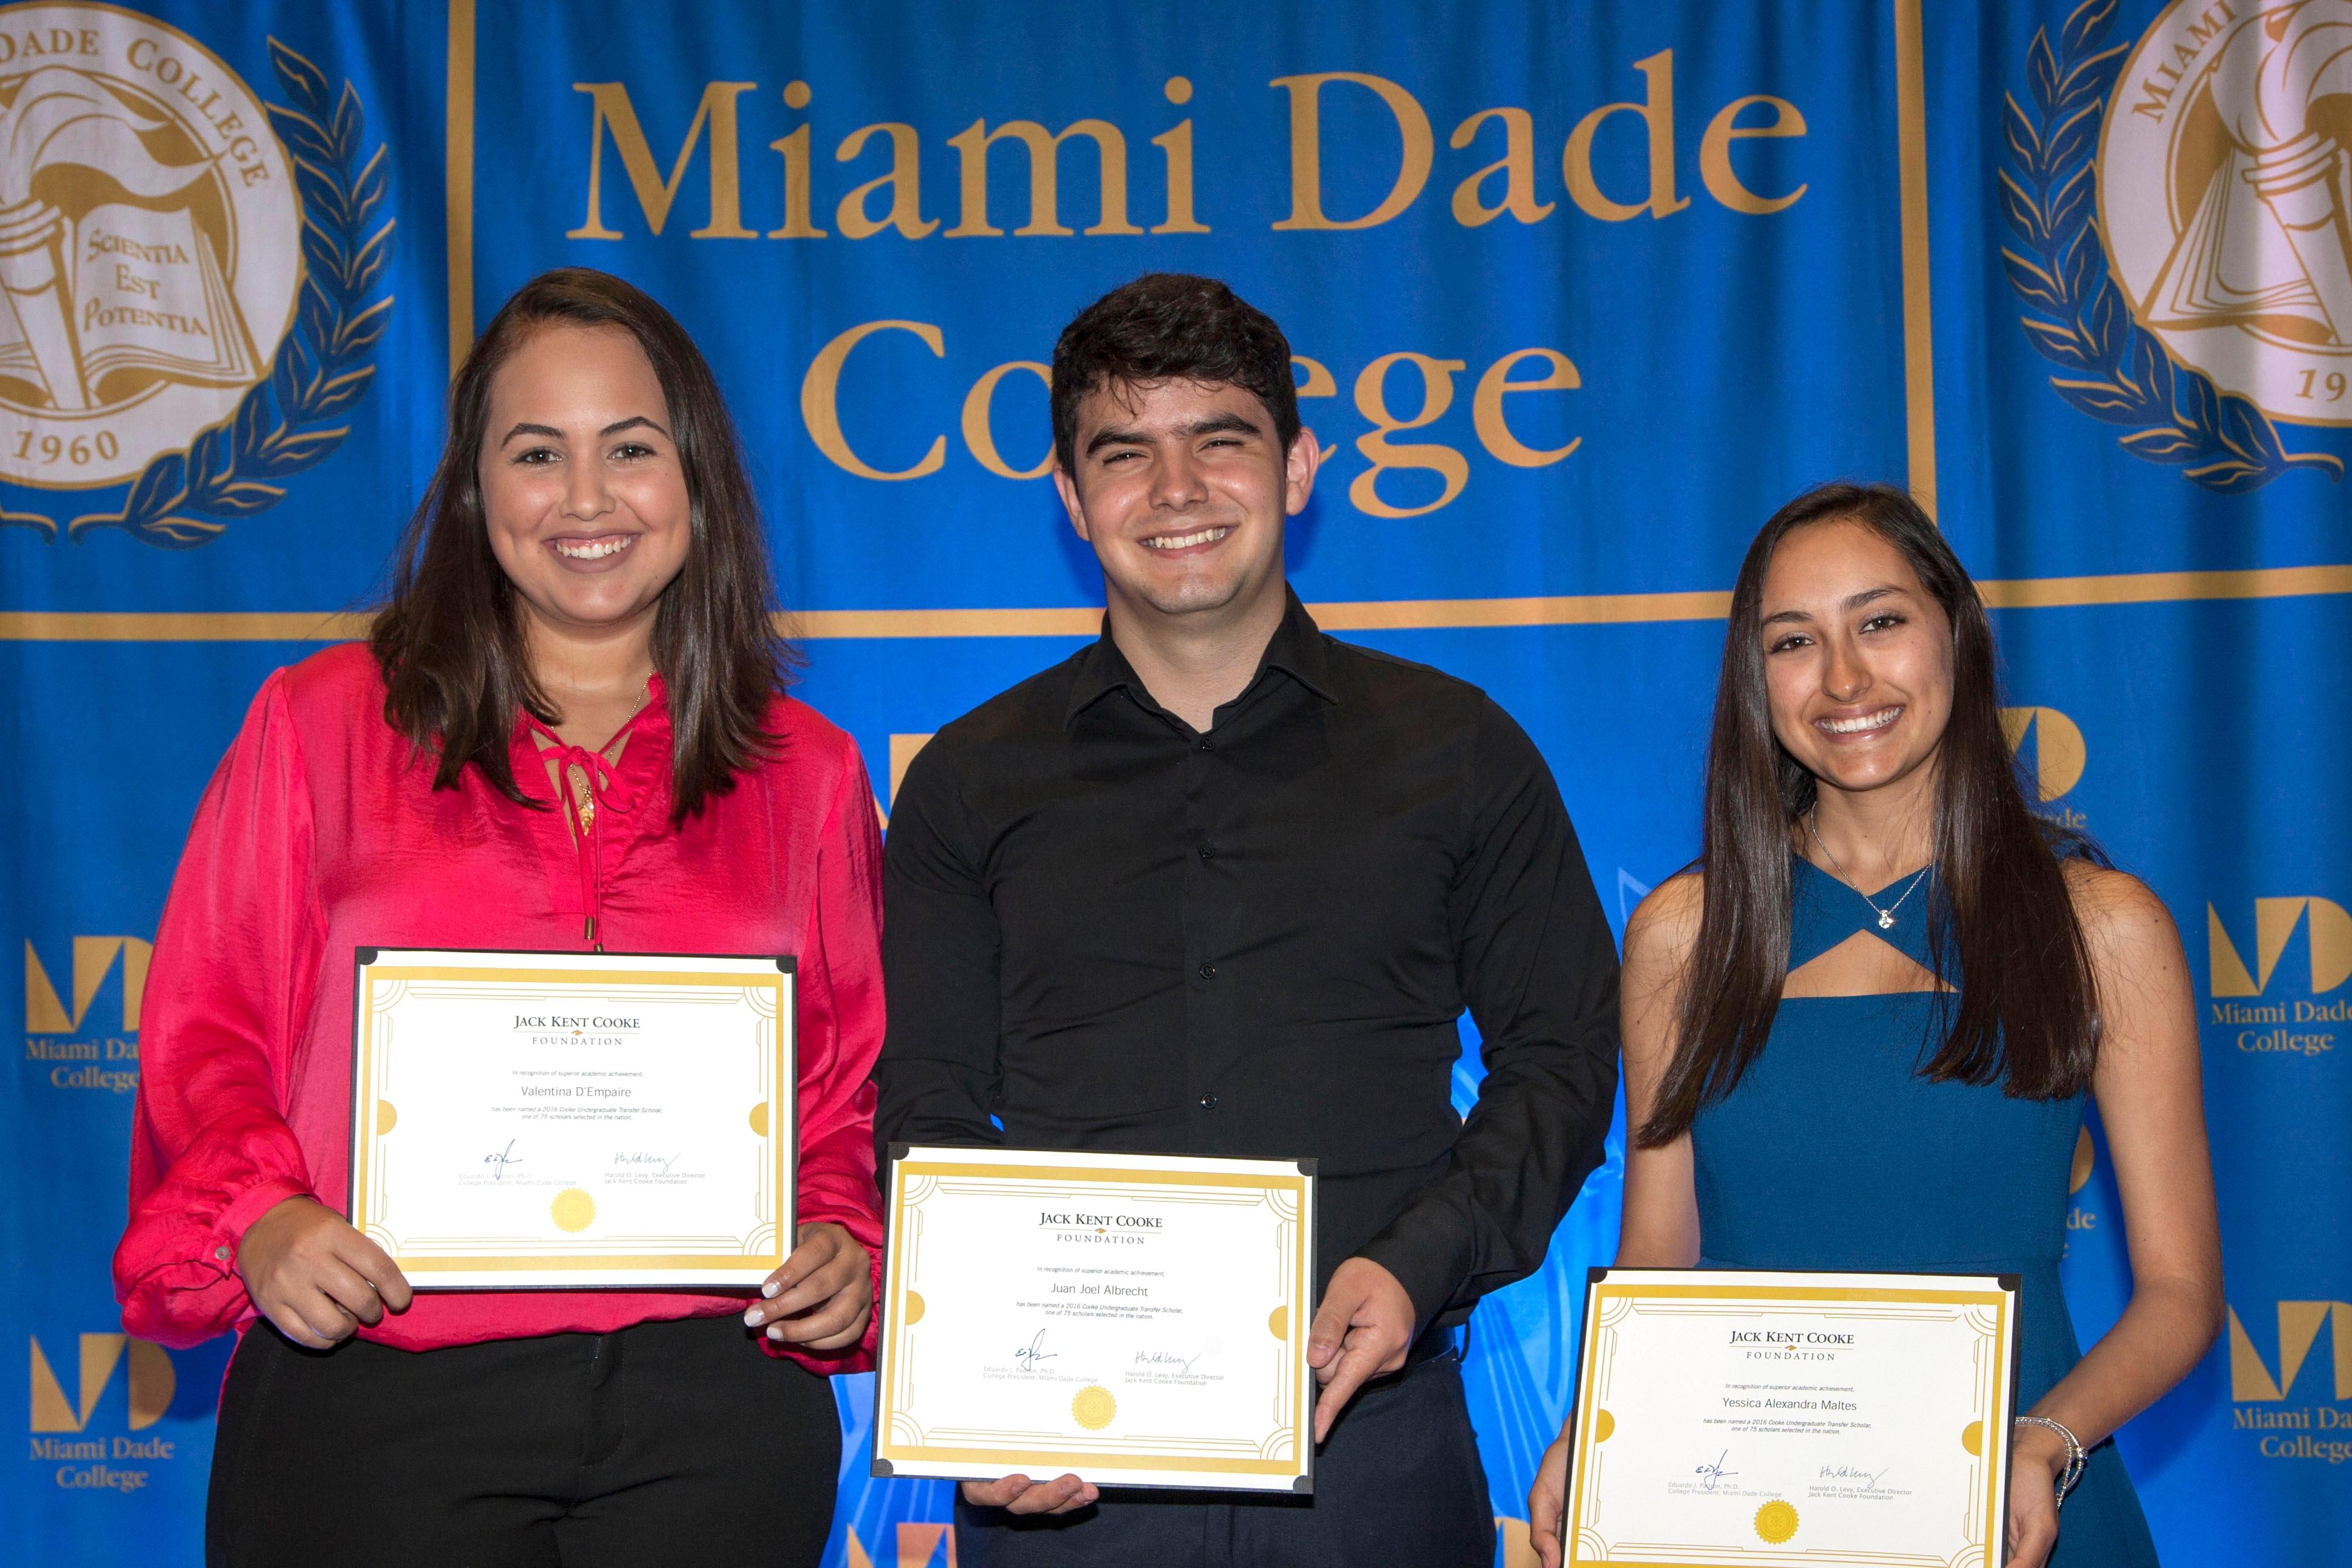 Miami_Dade_new_UT_scholars_1.jpg